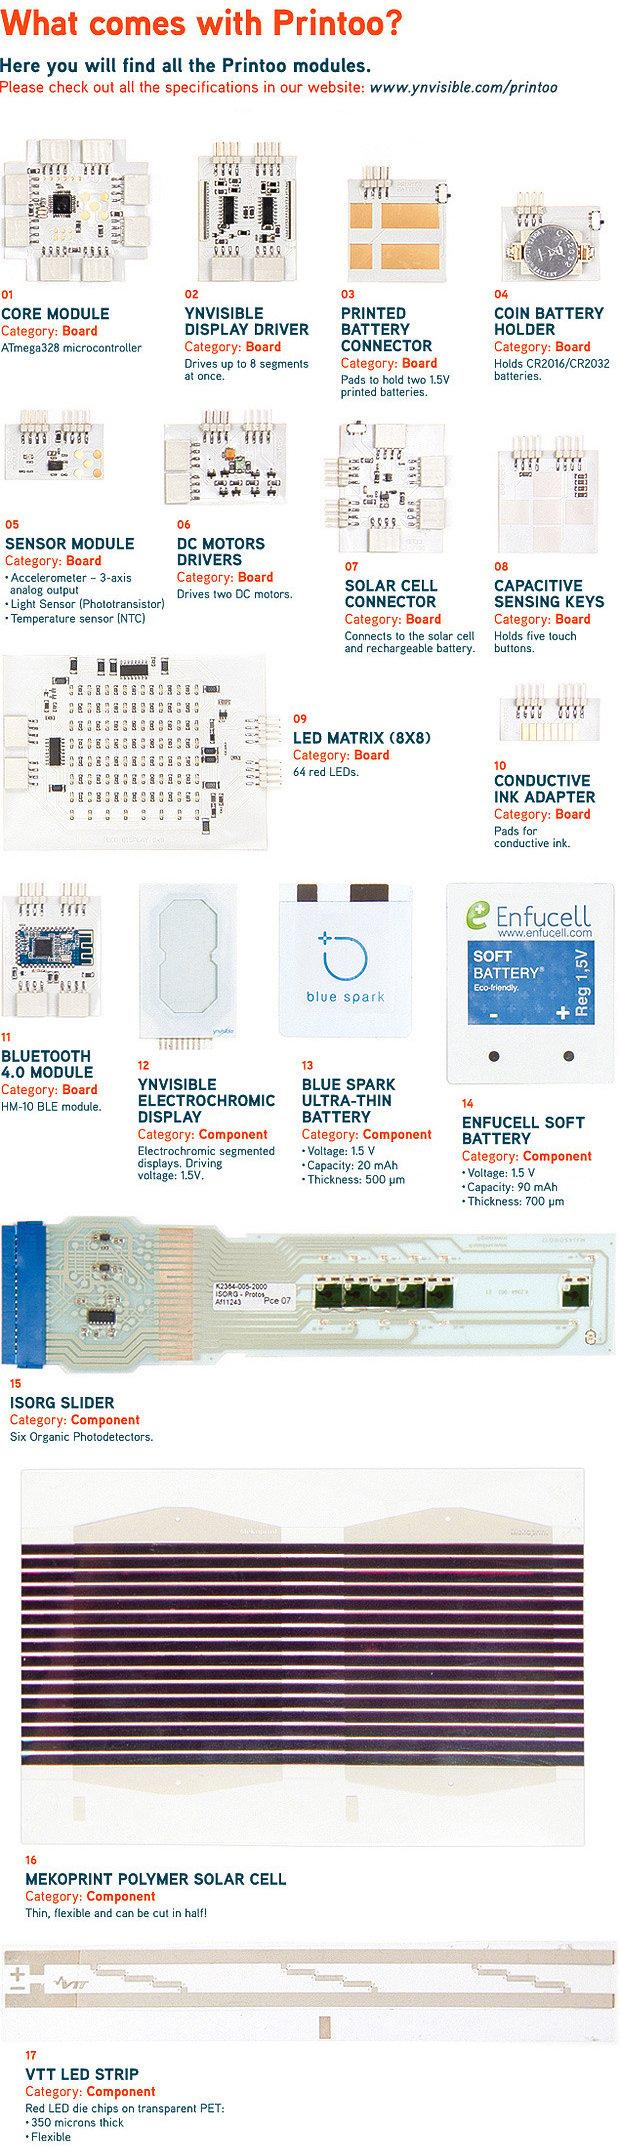 printoo-thin-flexible-modular-electronics-components-2